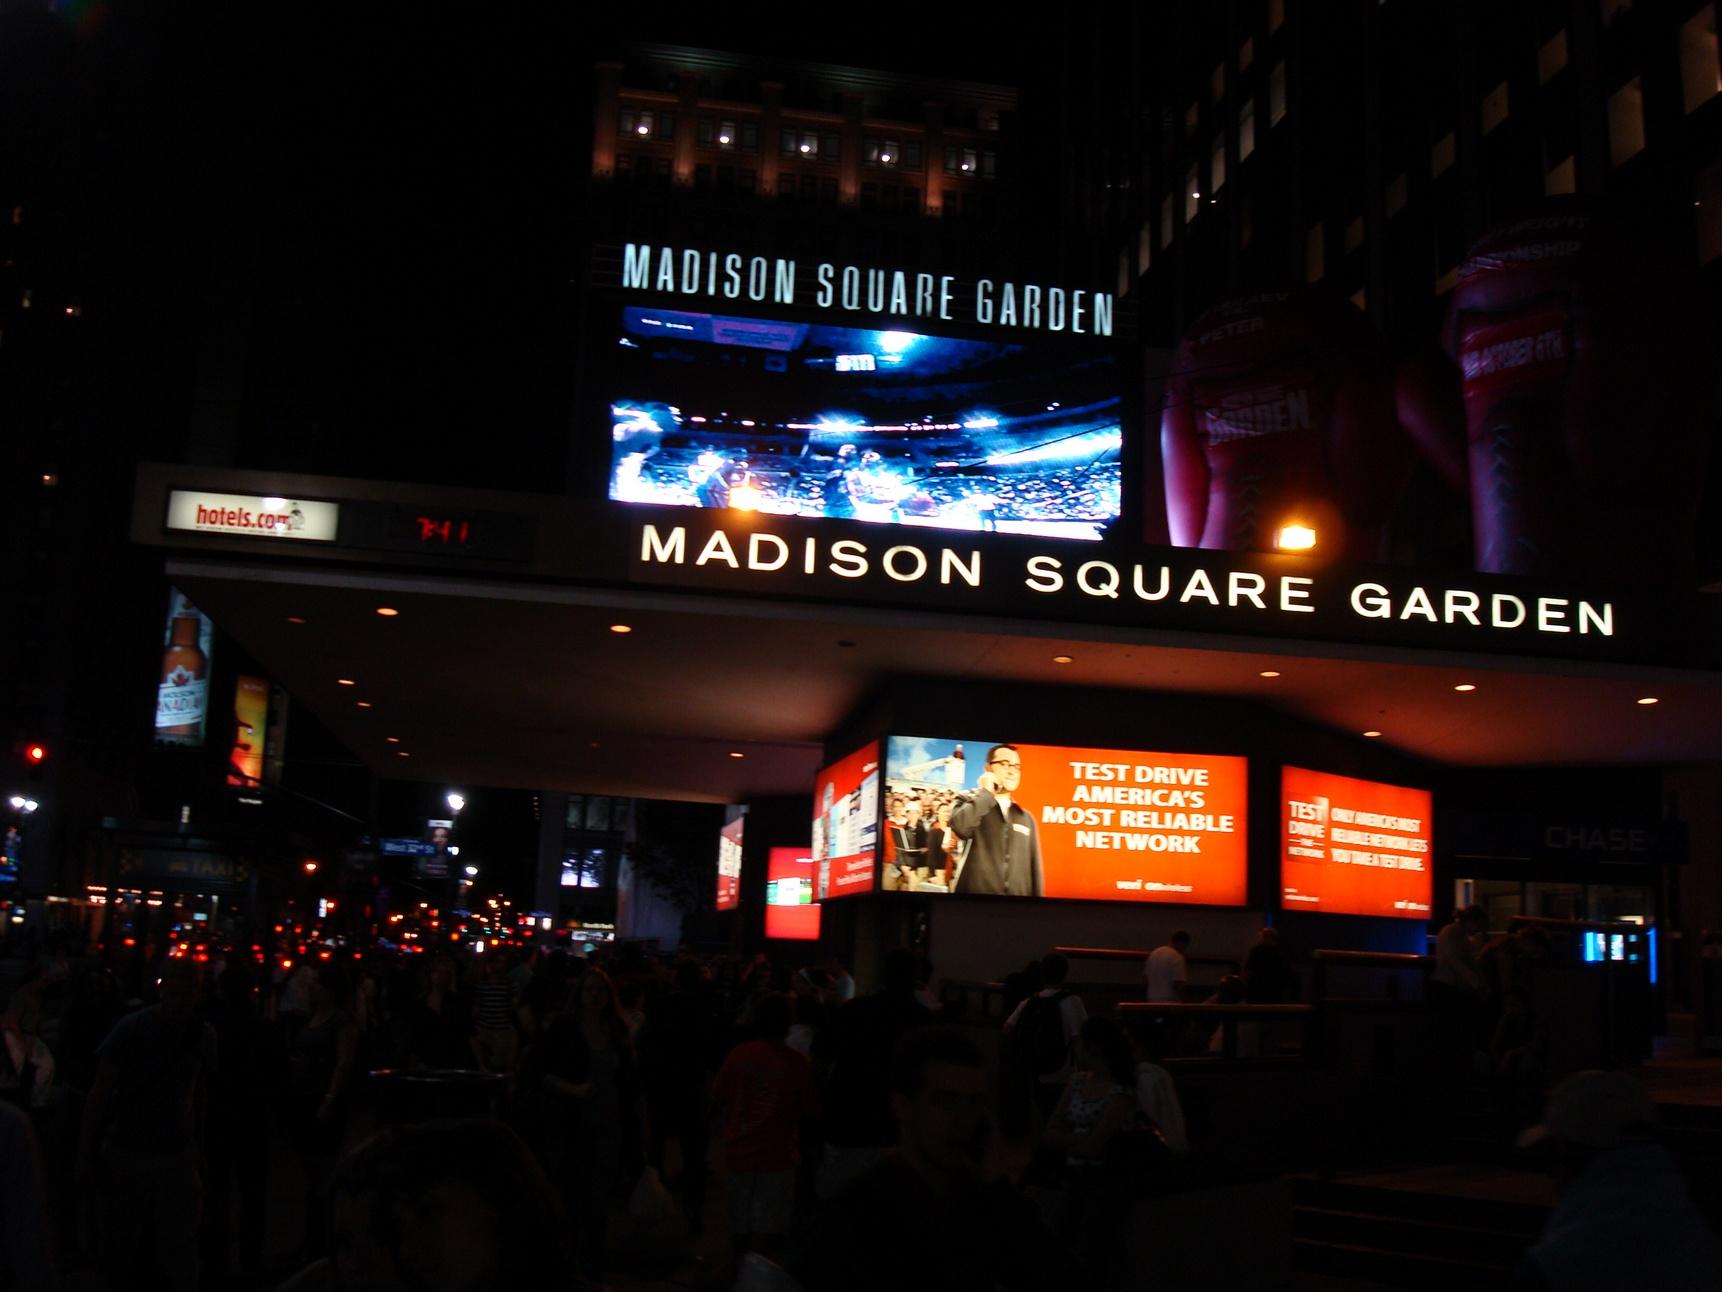 New York City_MadisonSquareGarden_Entrance_PennStation